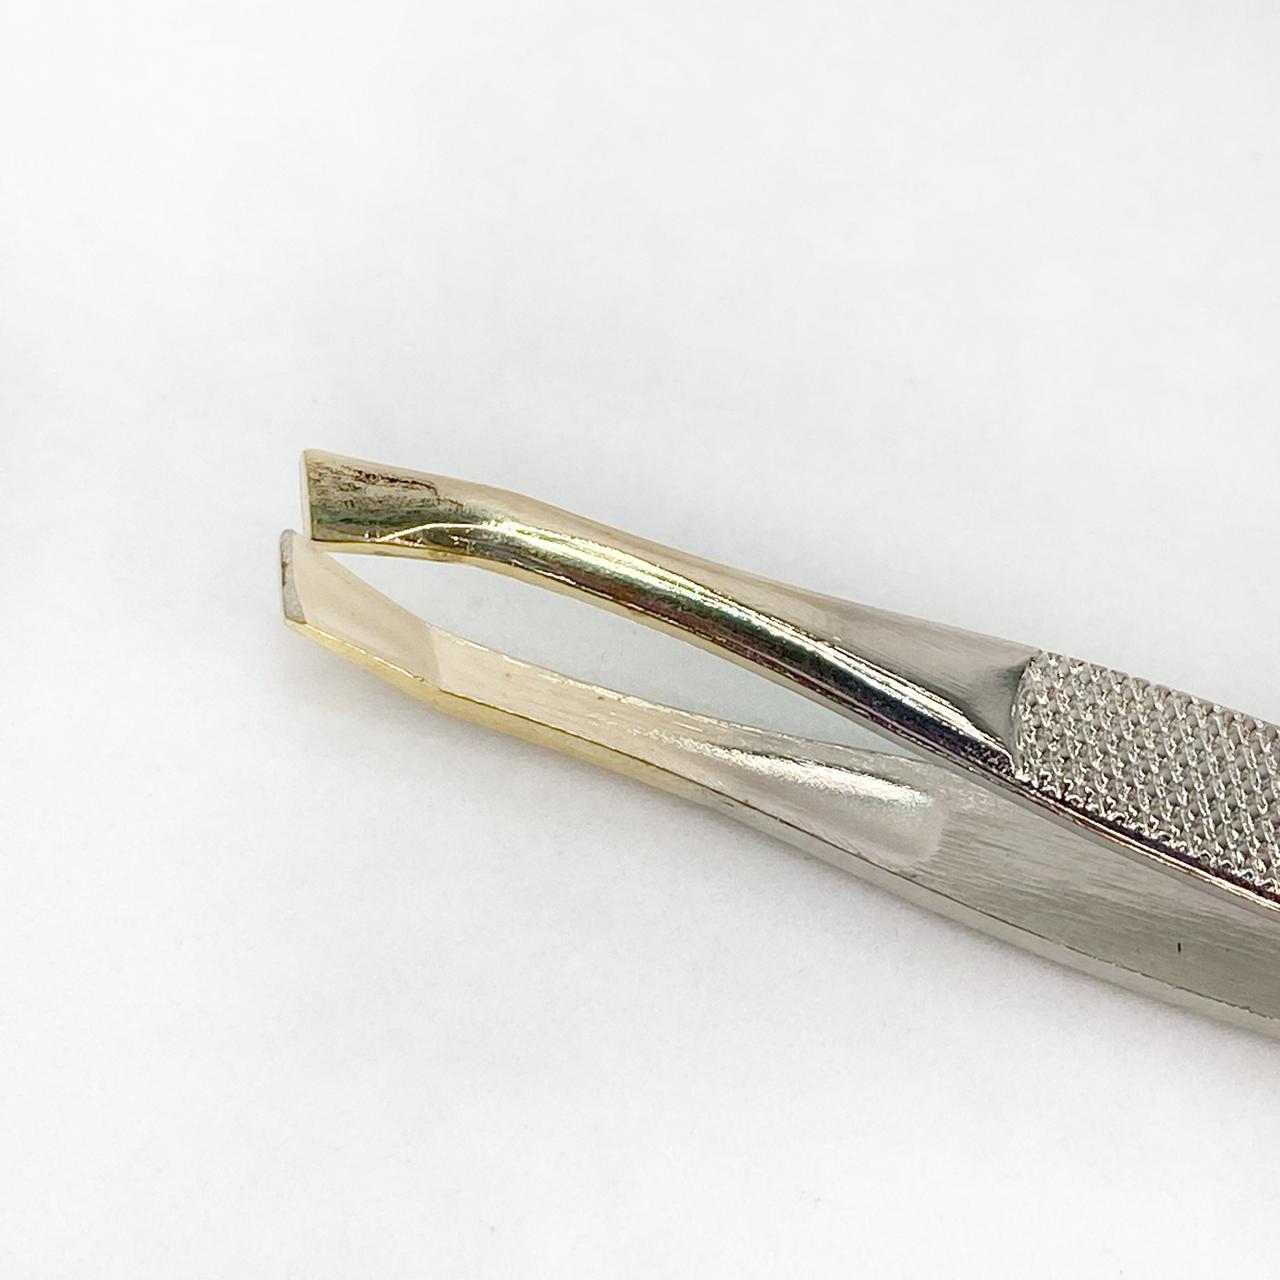 Pinça aço inox ponta chanfrada PT-26